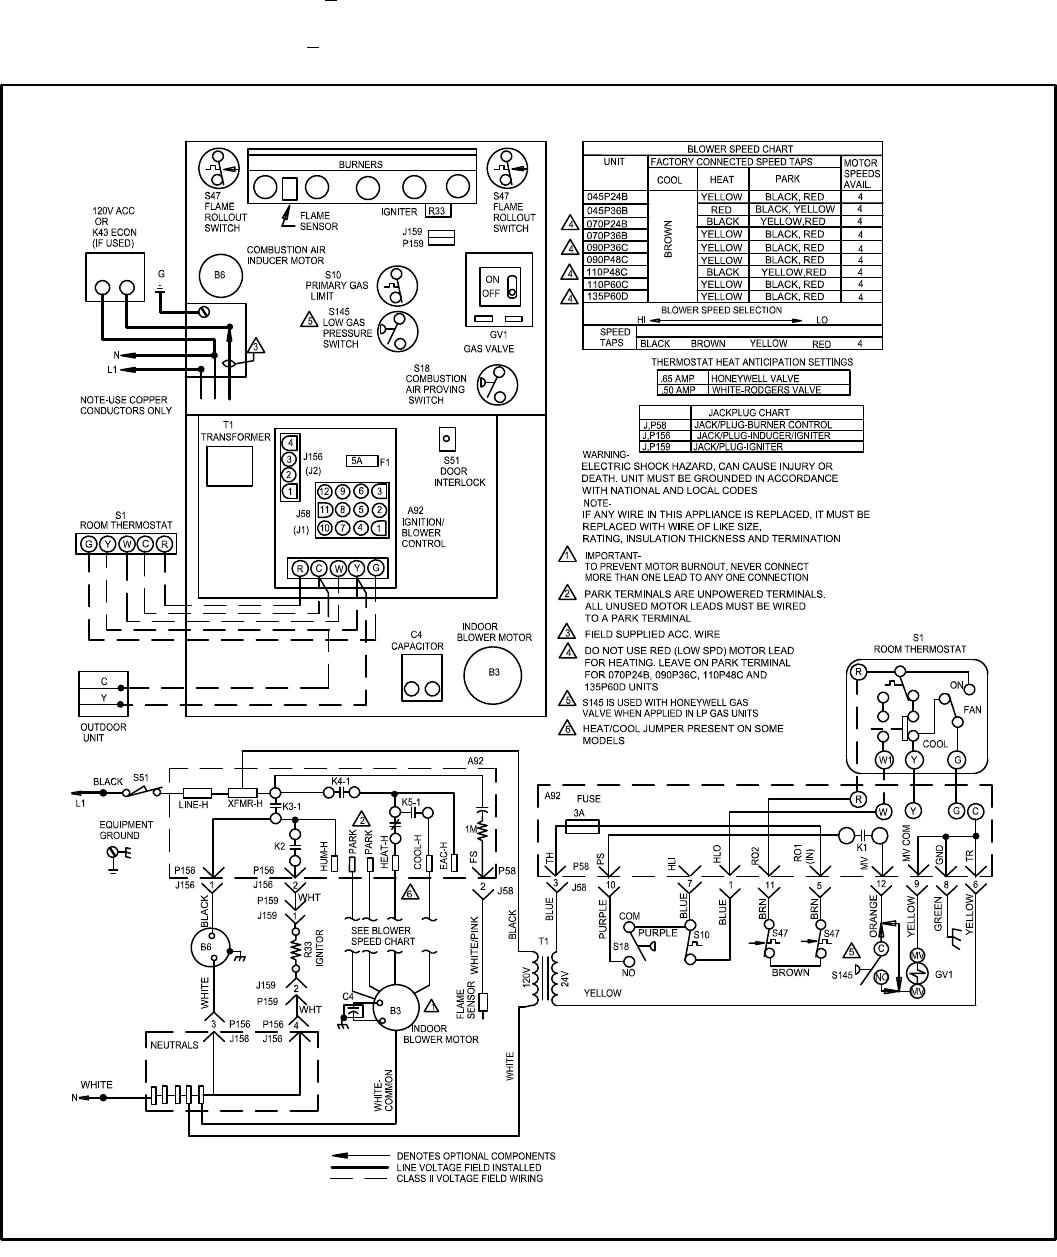 34 Upflow Furnace Diagram